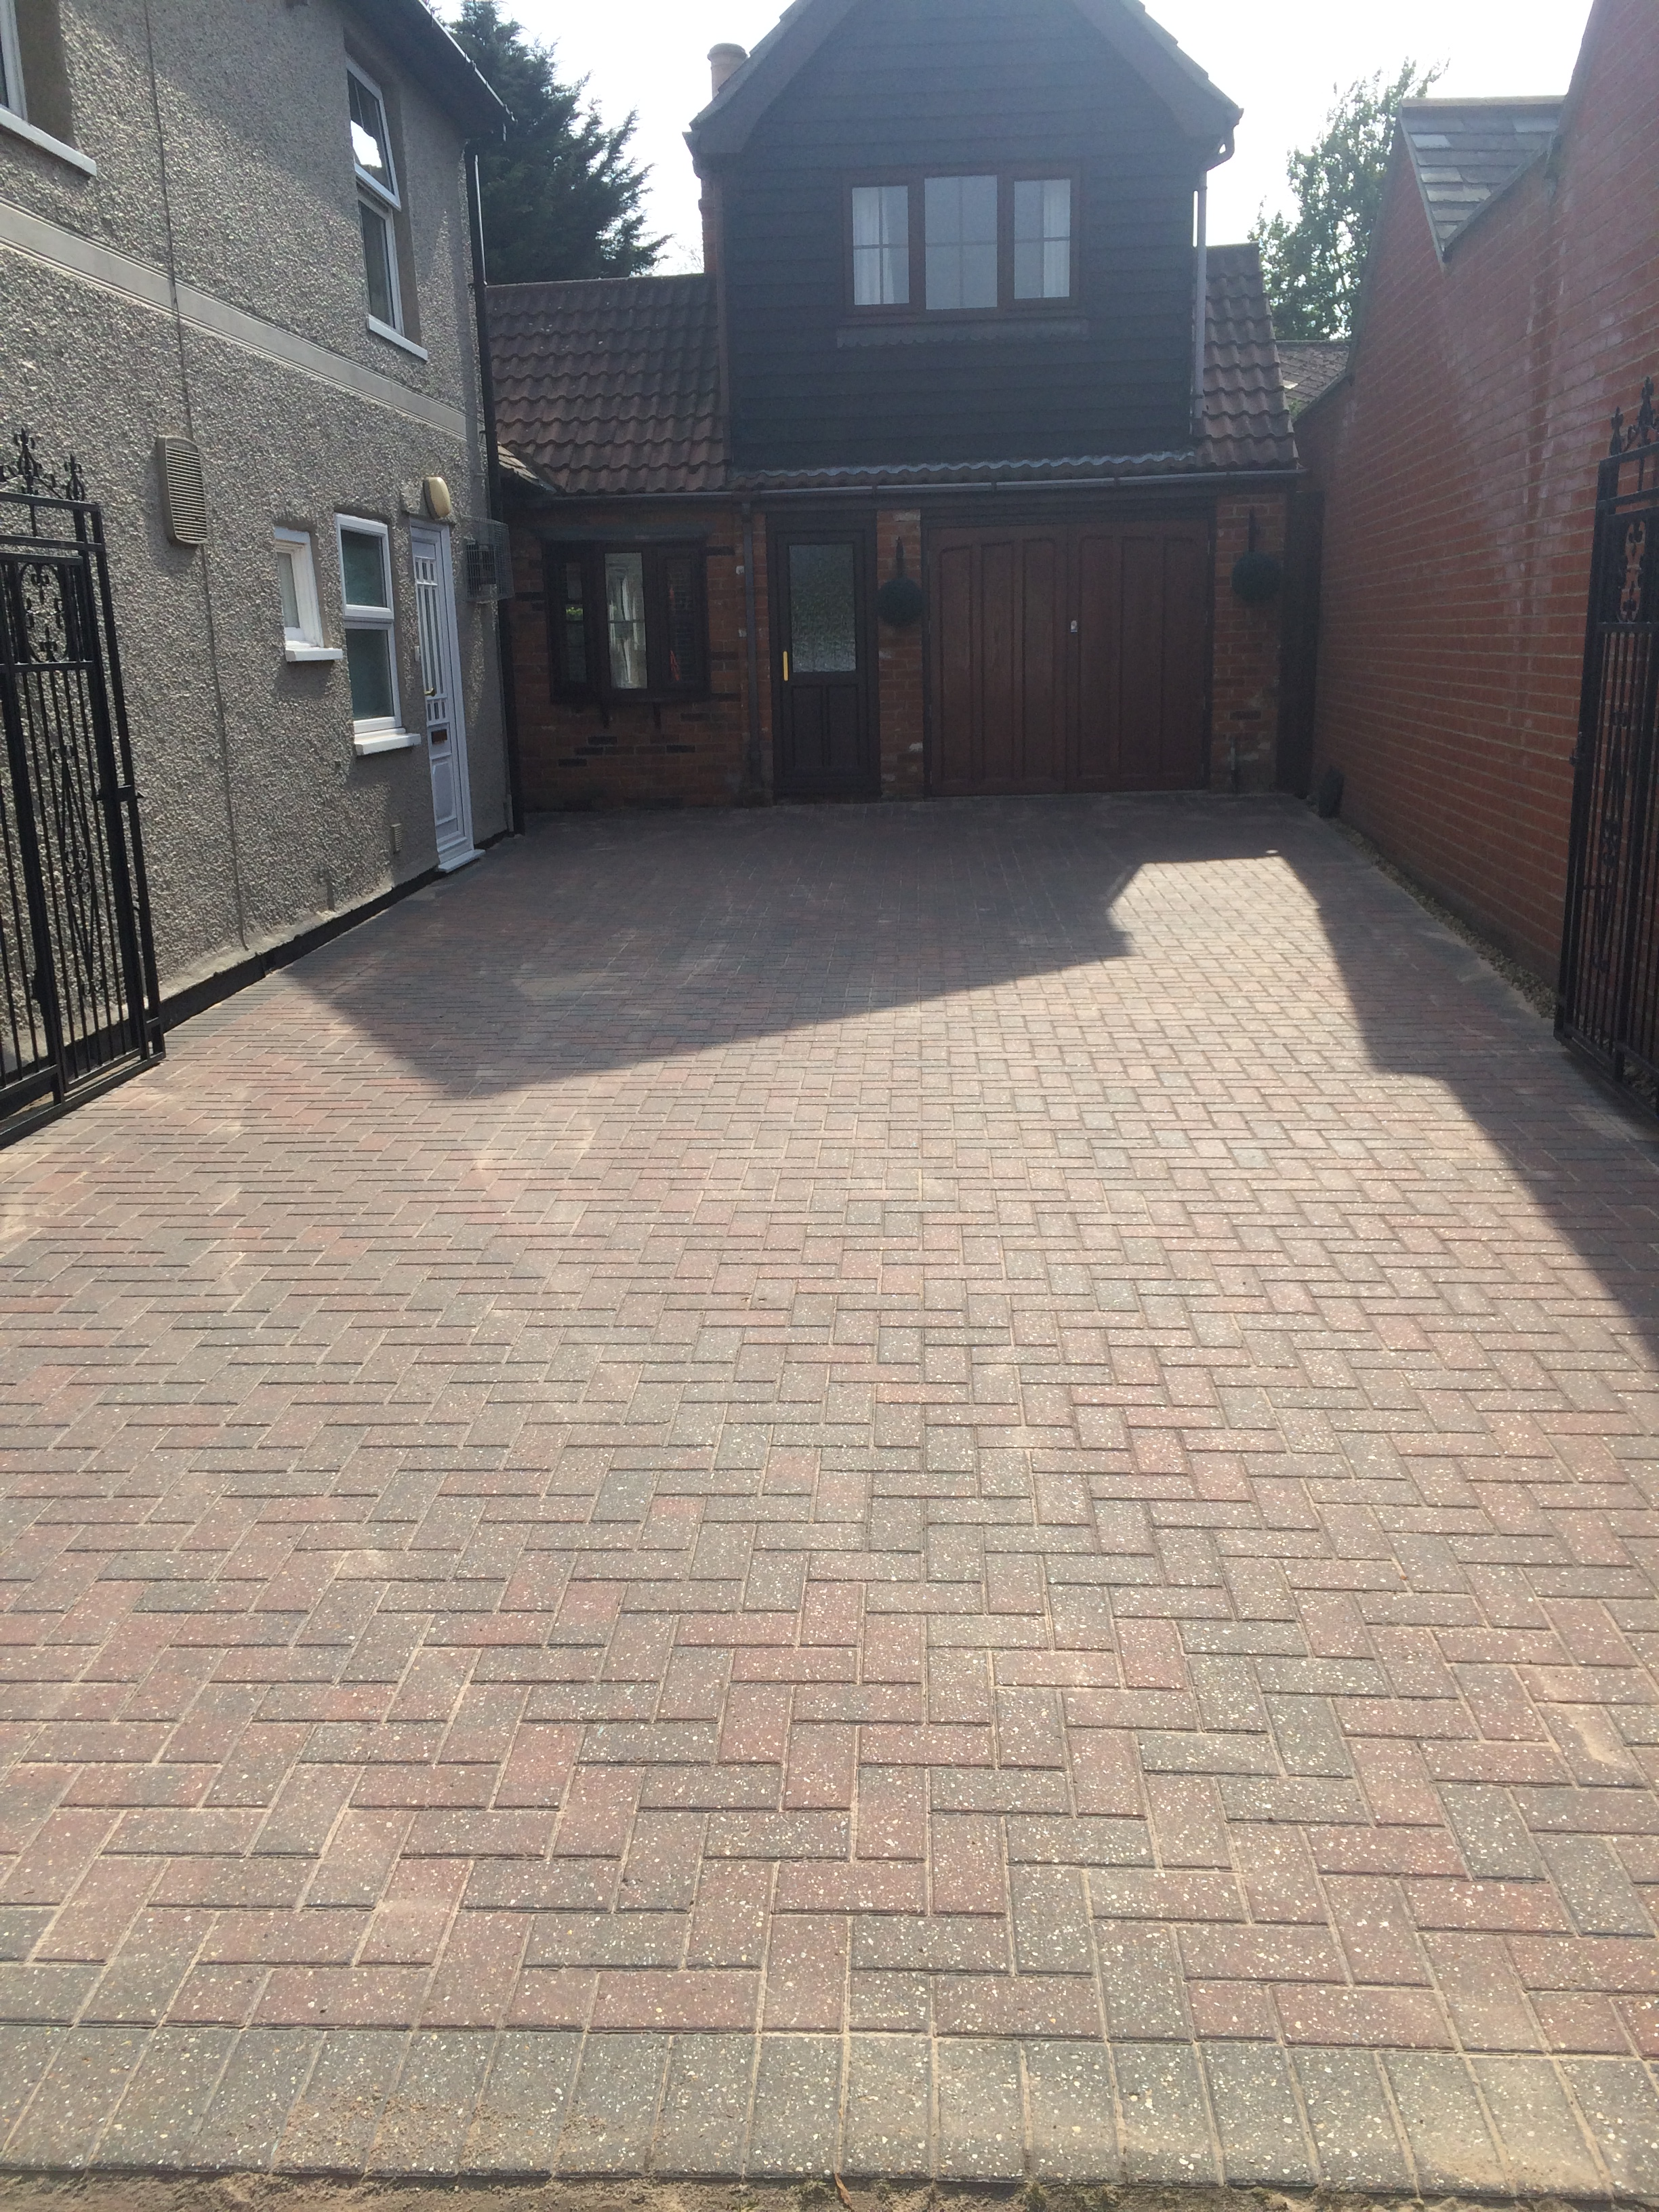 Communal driveway